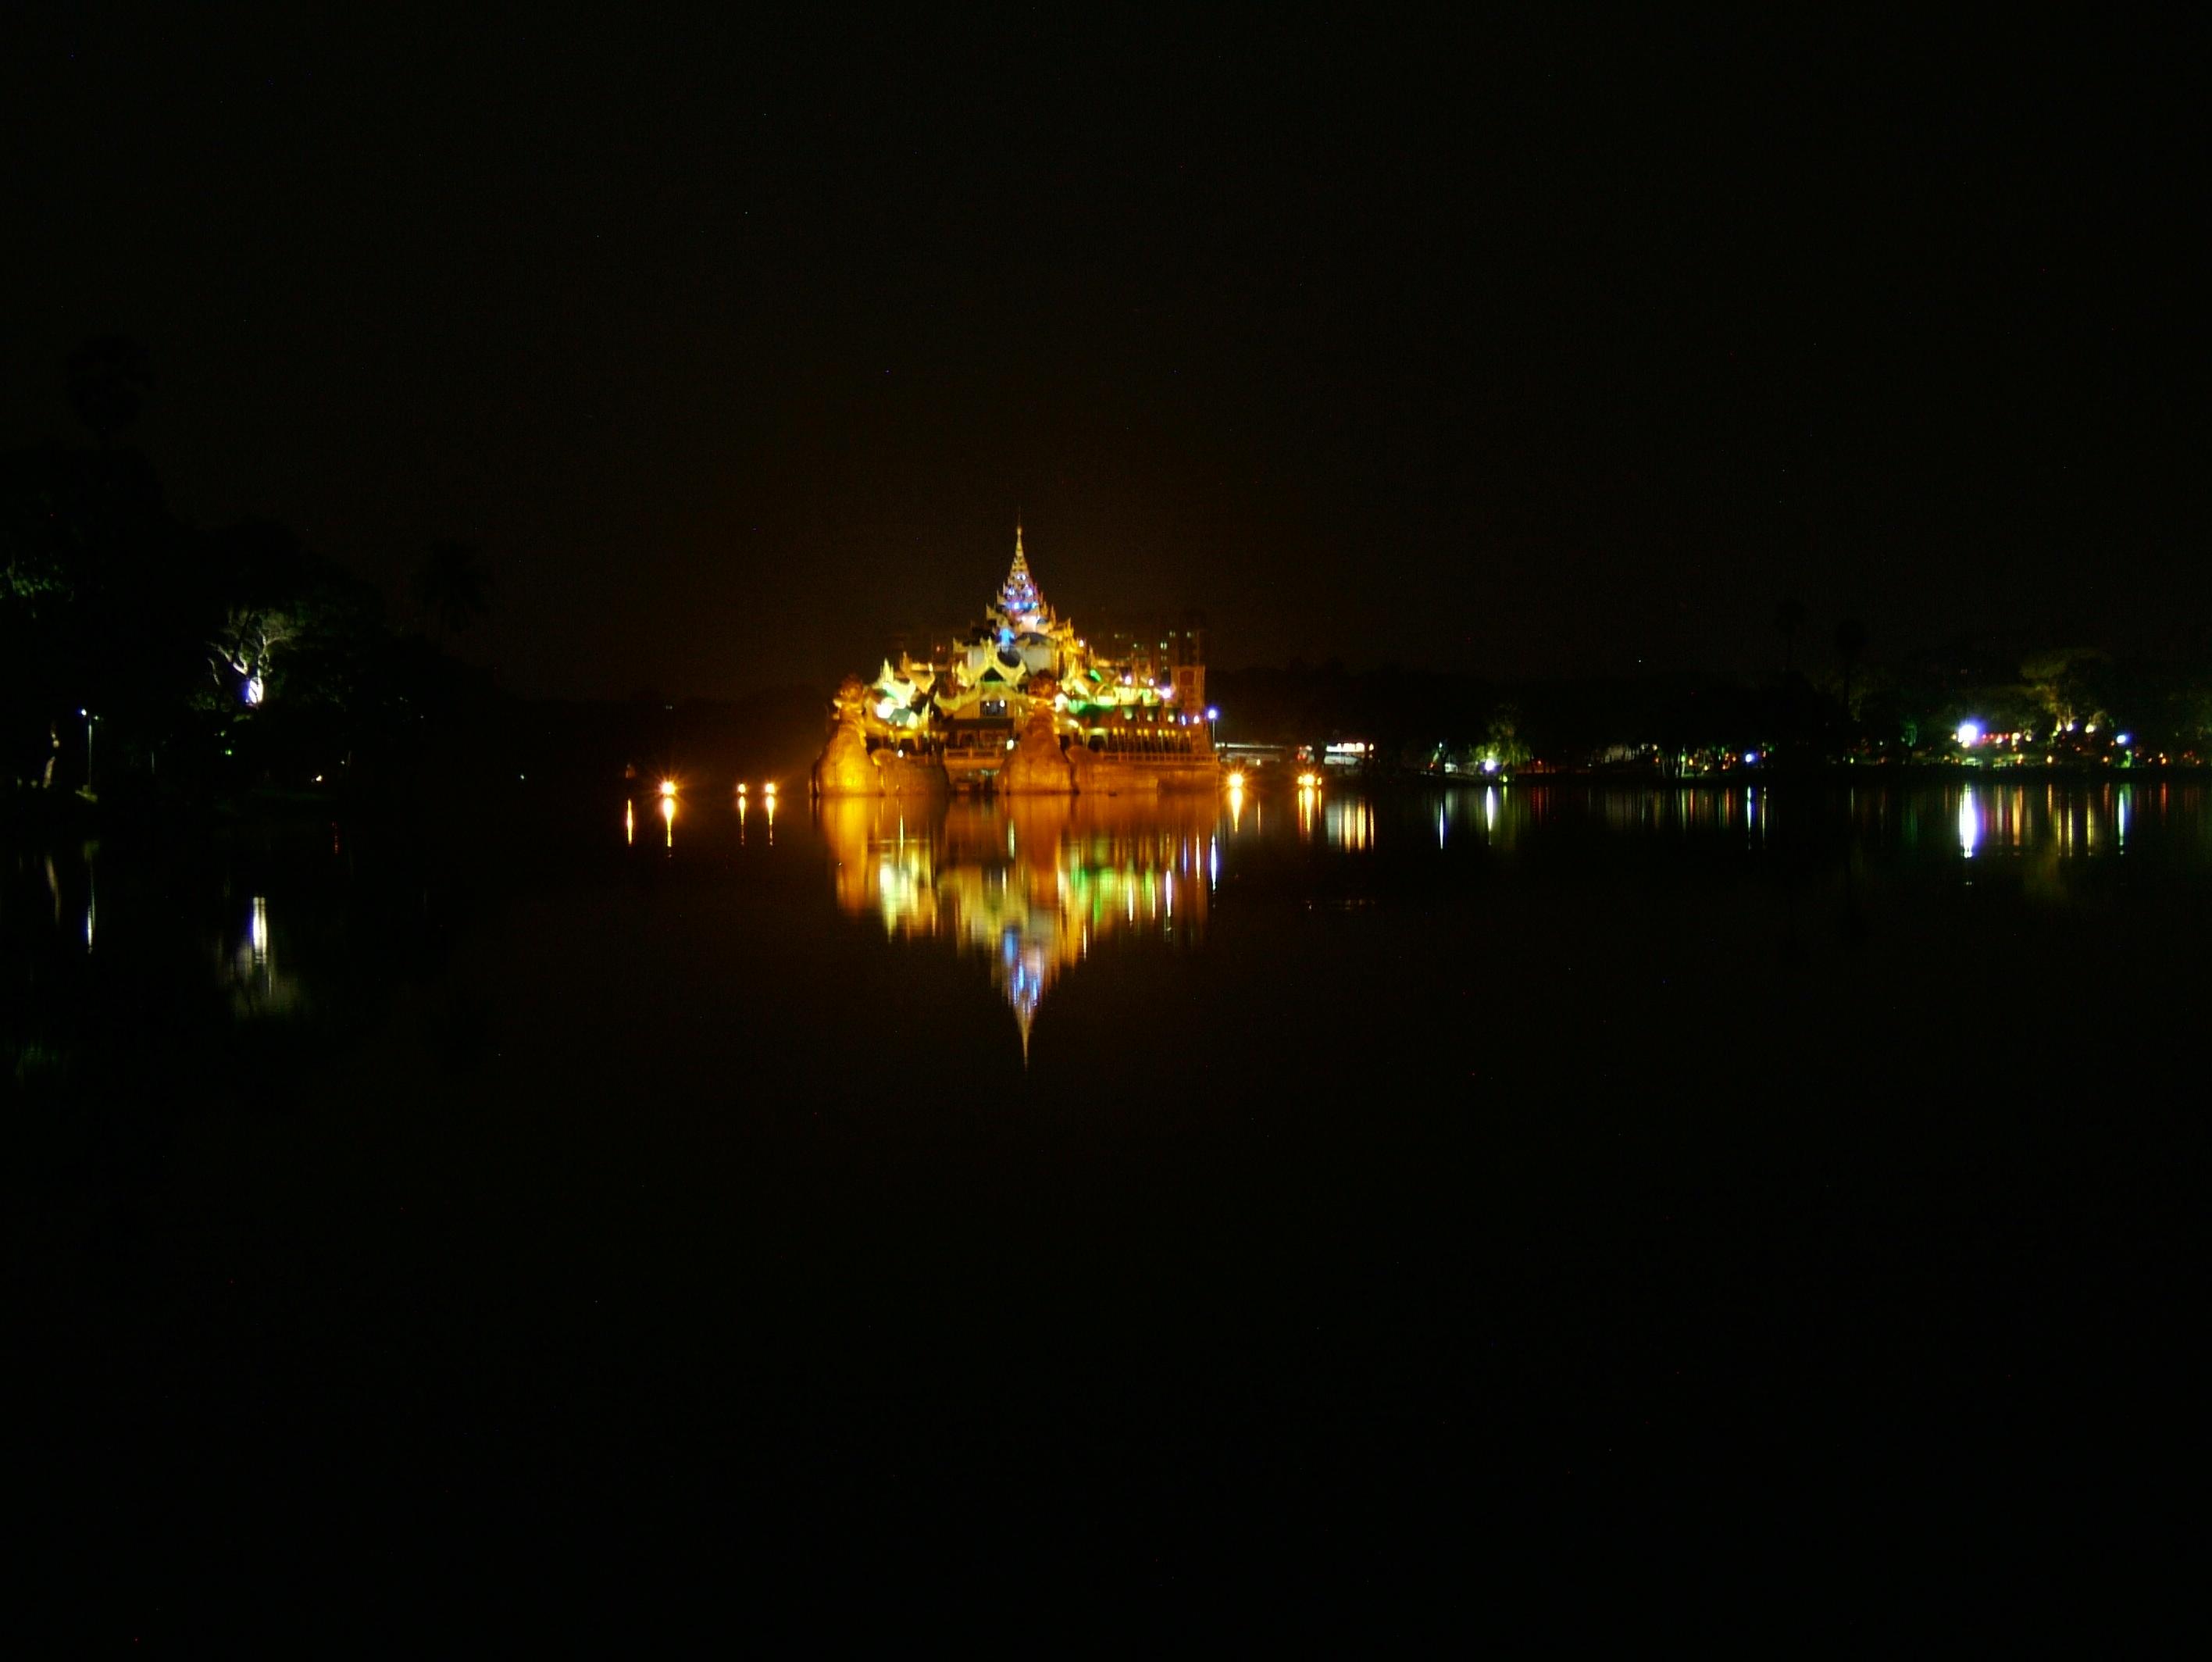 Myanmar Yangon Kandawgyi Palace Hotel royal barge Nov 2004 01